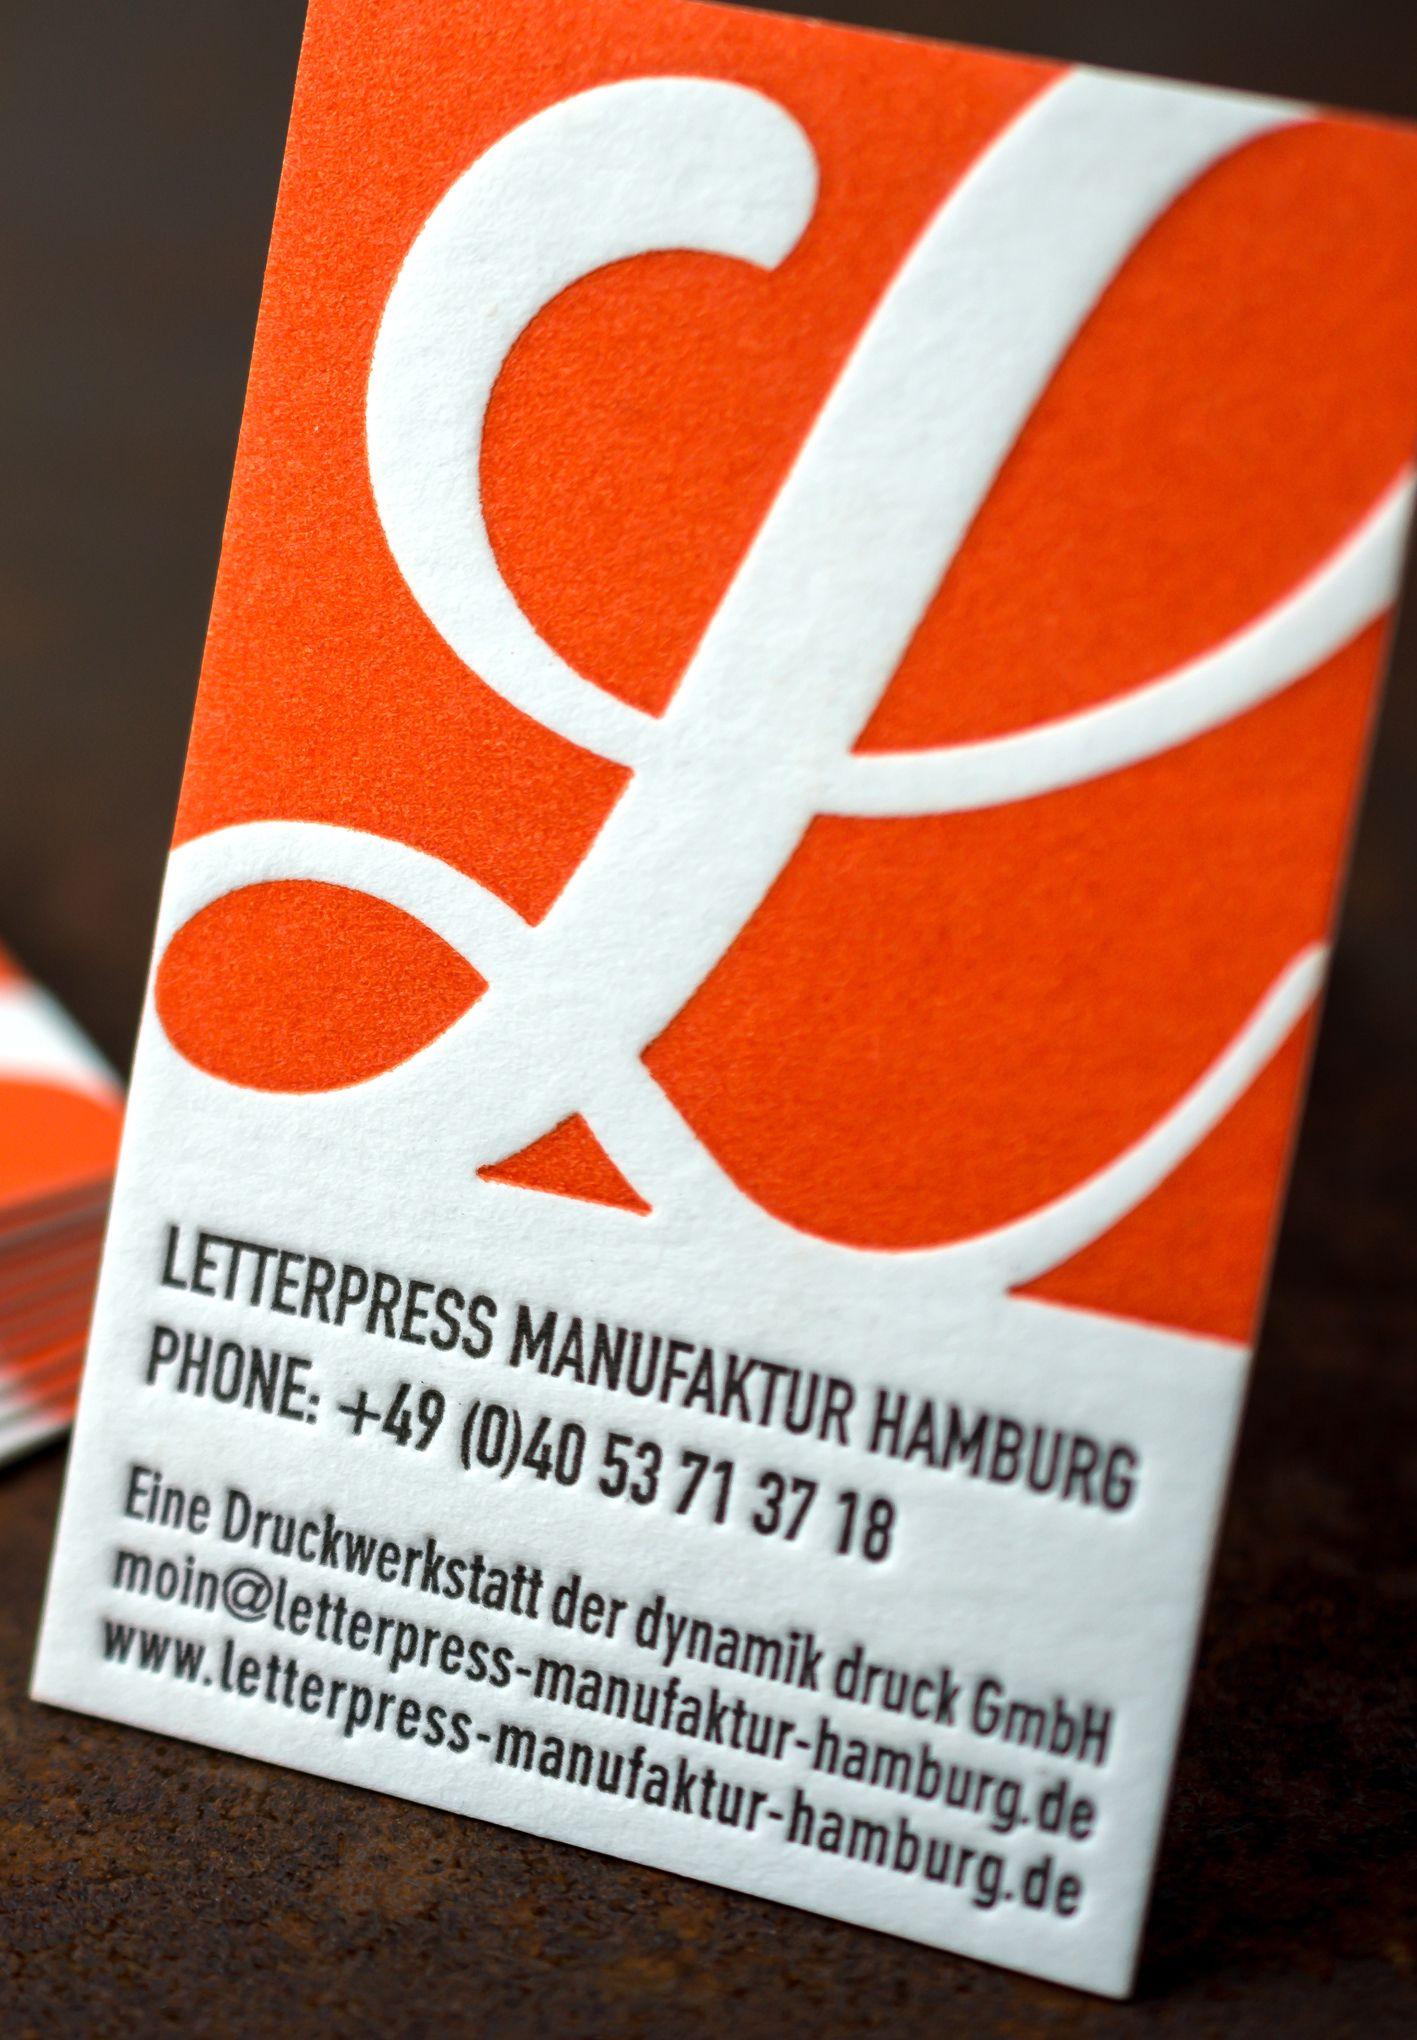 Business Card Letterpress Manufaktur Hamburg Colour